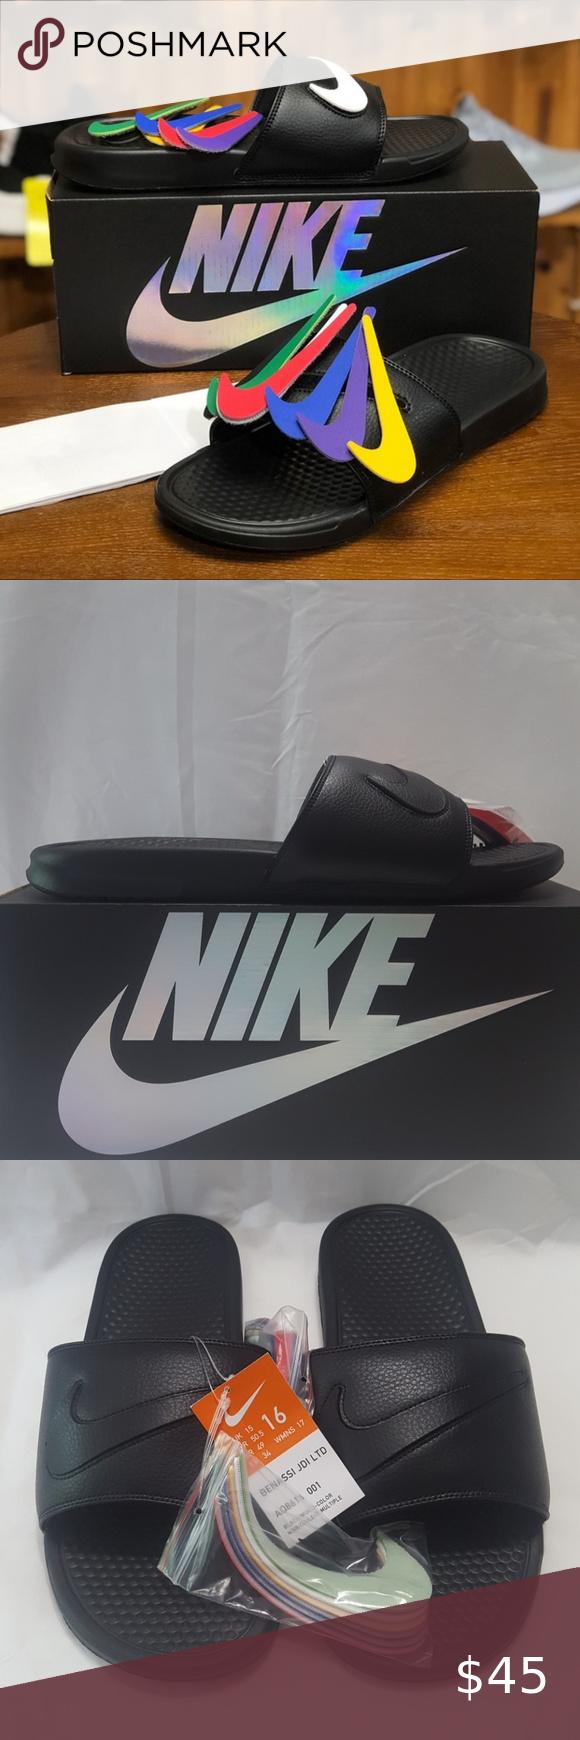 f060800503c5 New Men s Nike Benassi JDI LTD Sandal Swoosh 100% Authentic Description  Benassi  JDI LTD Sandal Condition  Brand New with Original Box Style Code  ...